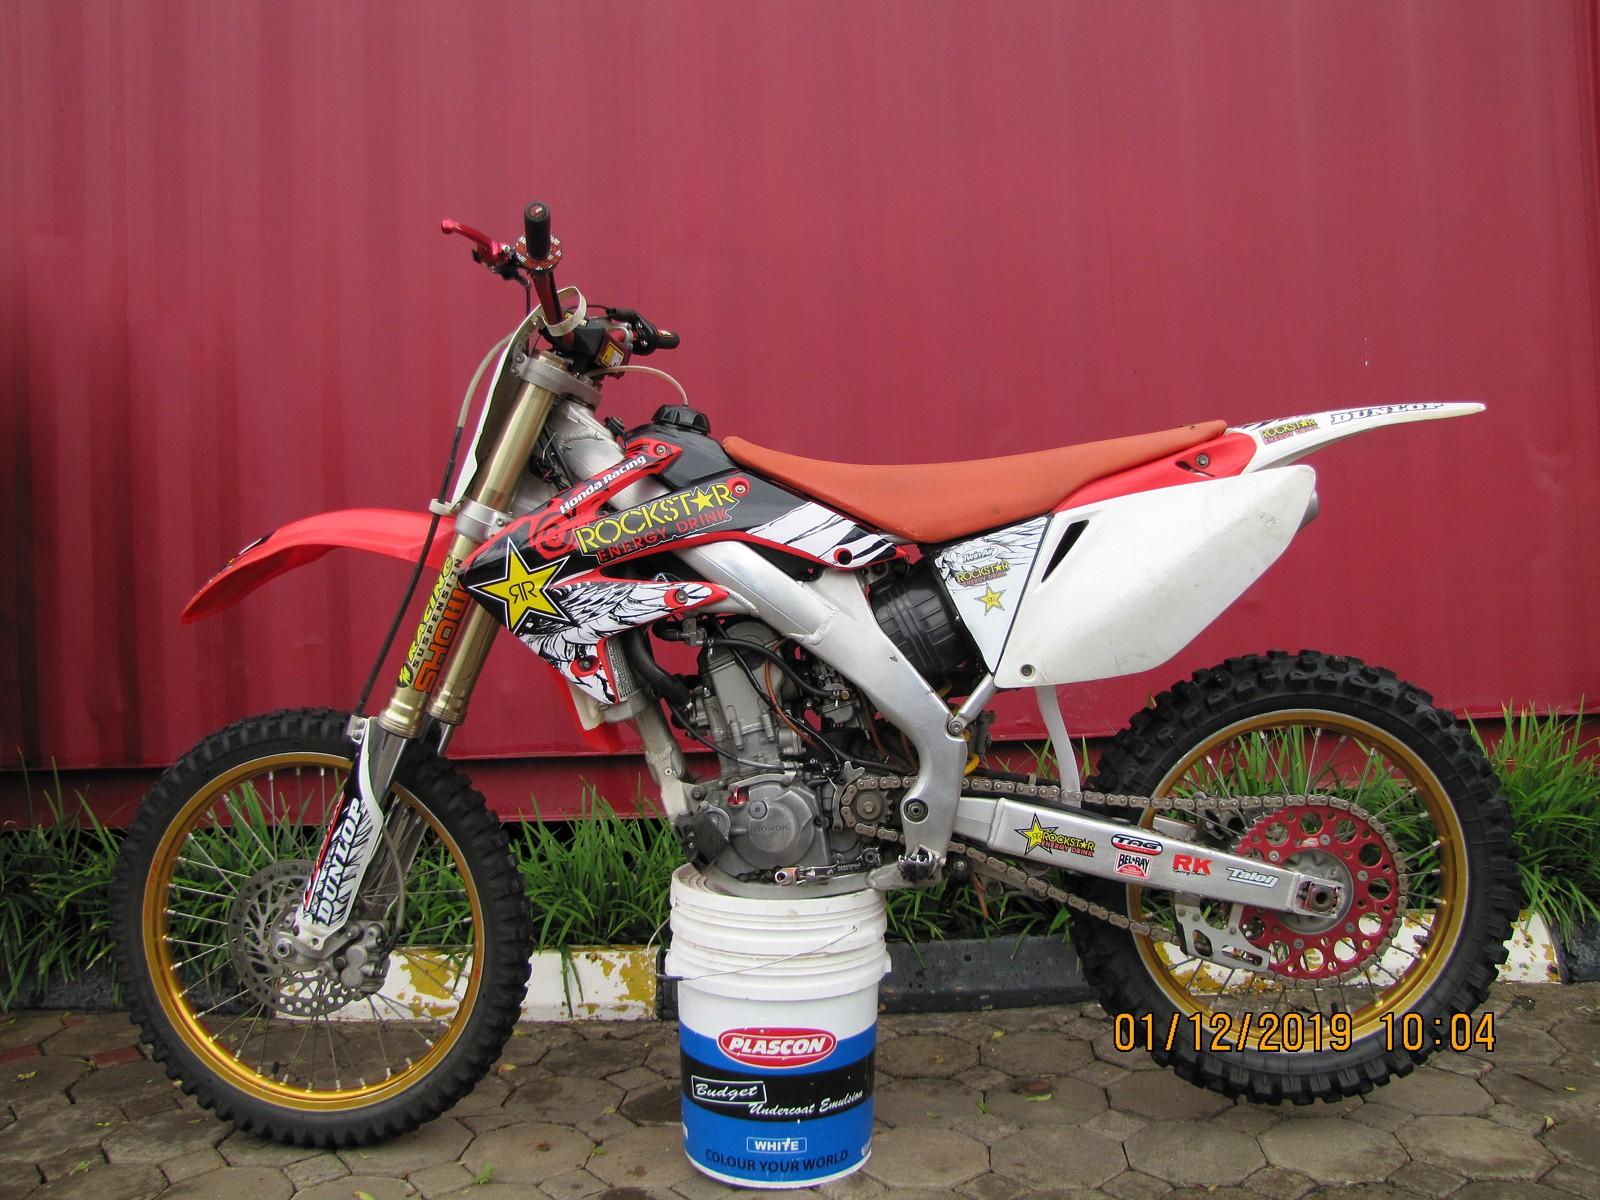 IMG 0025 - banny wailer - Motocross Pictures - Vital MX